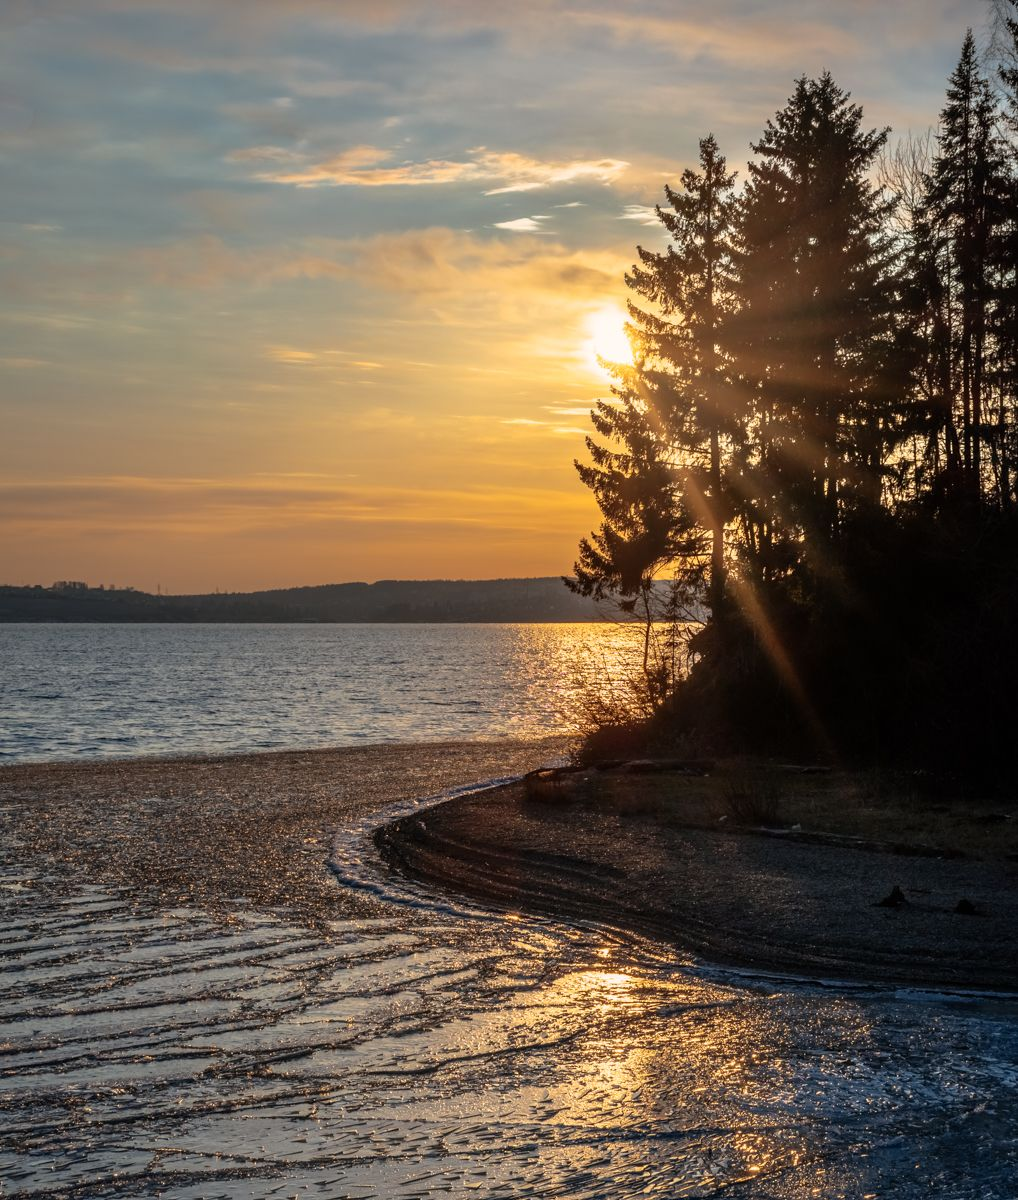 Прибрежная полоса Пейзаж Пермский край Пермь Урал лес солнце контраст зима лед